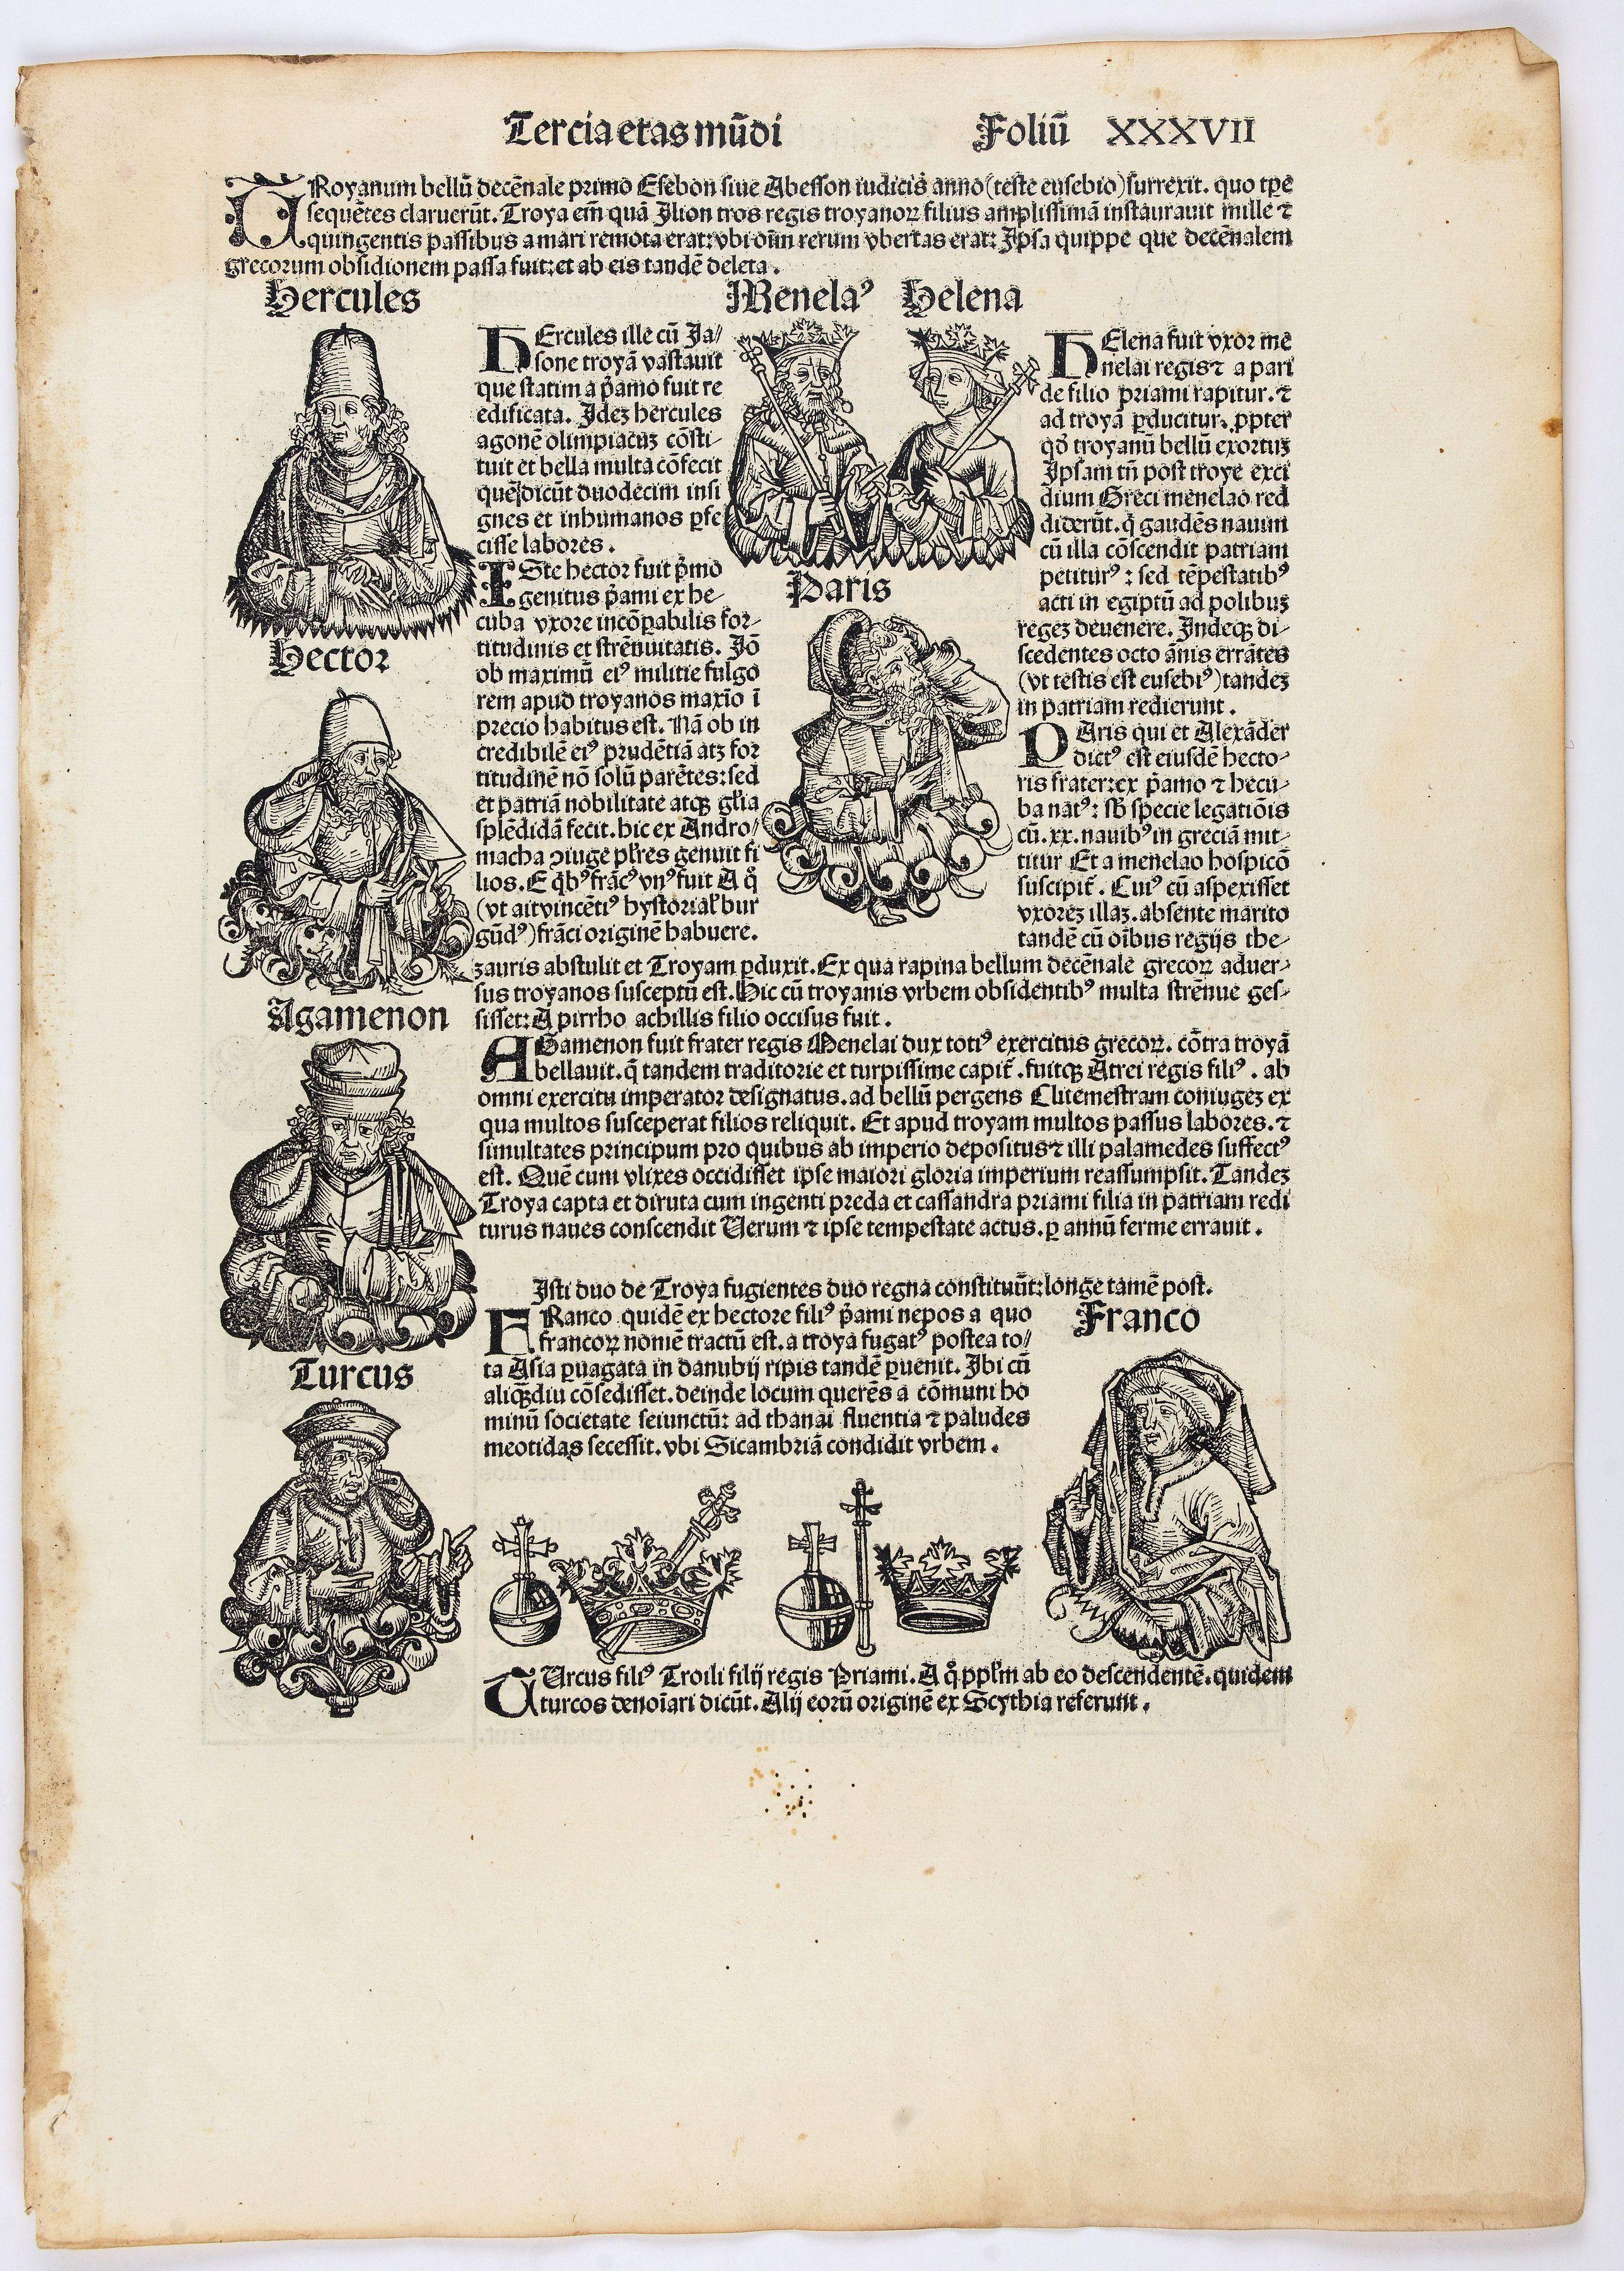 SCHEDEL, H. -  Tercia Etas Mundi. Folium. XXXVII